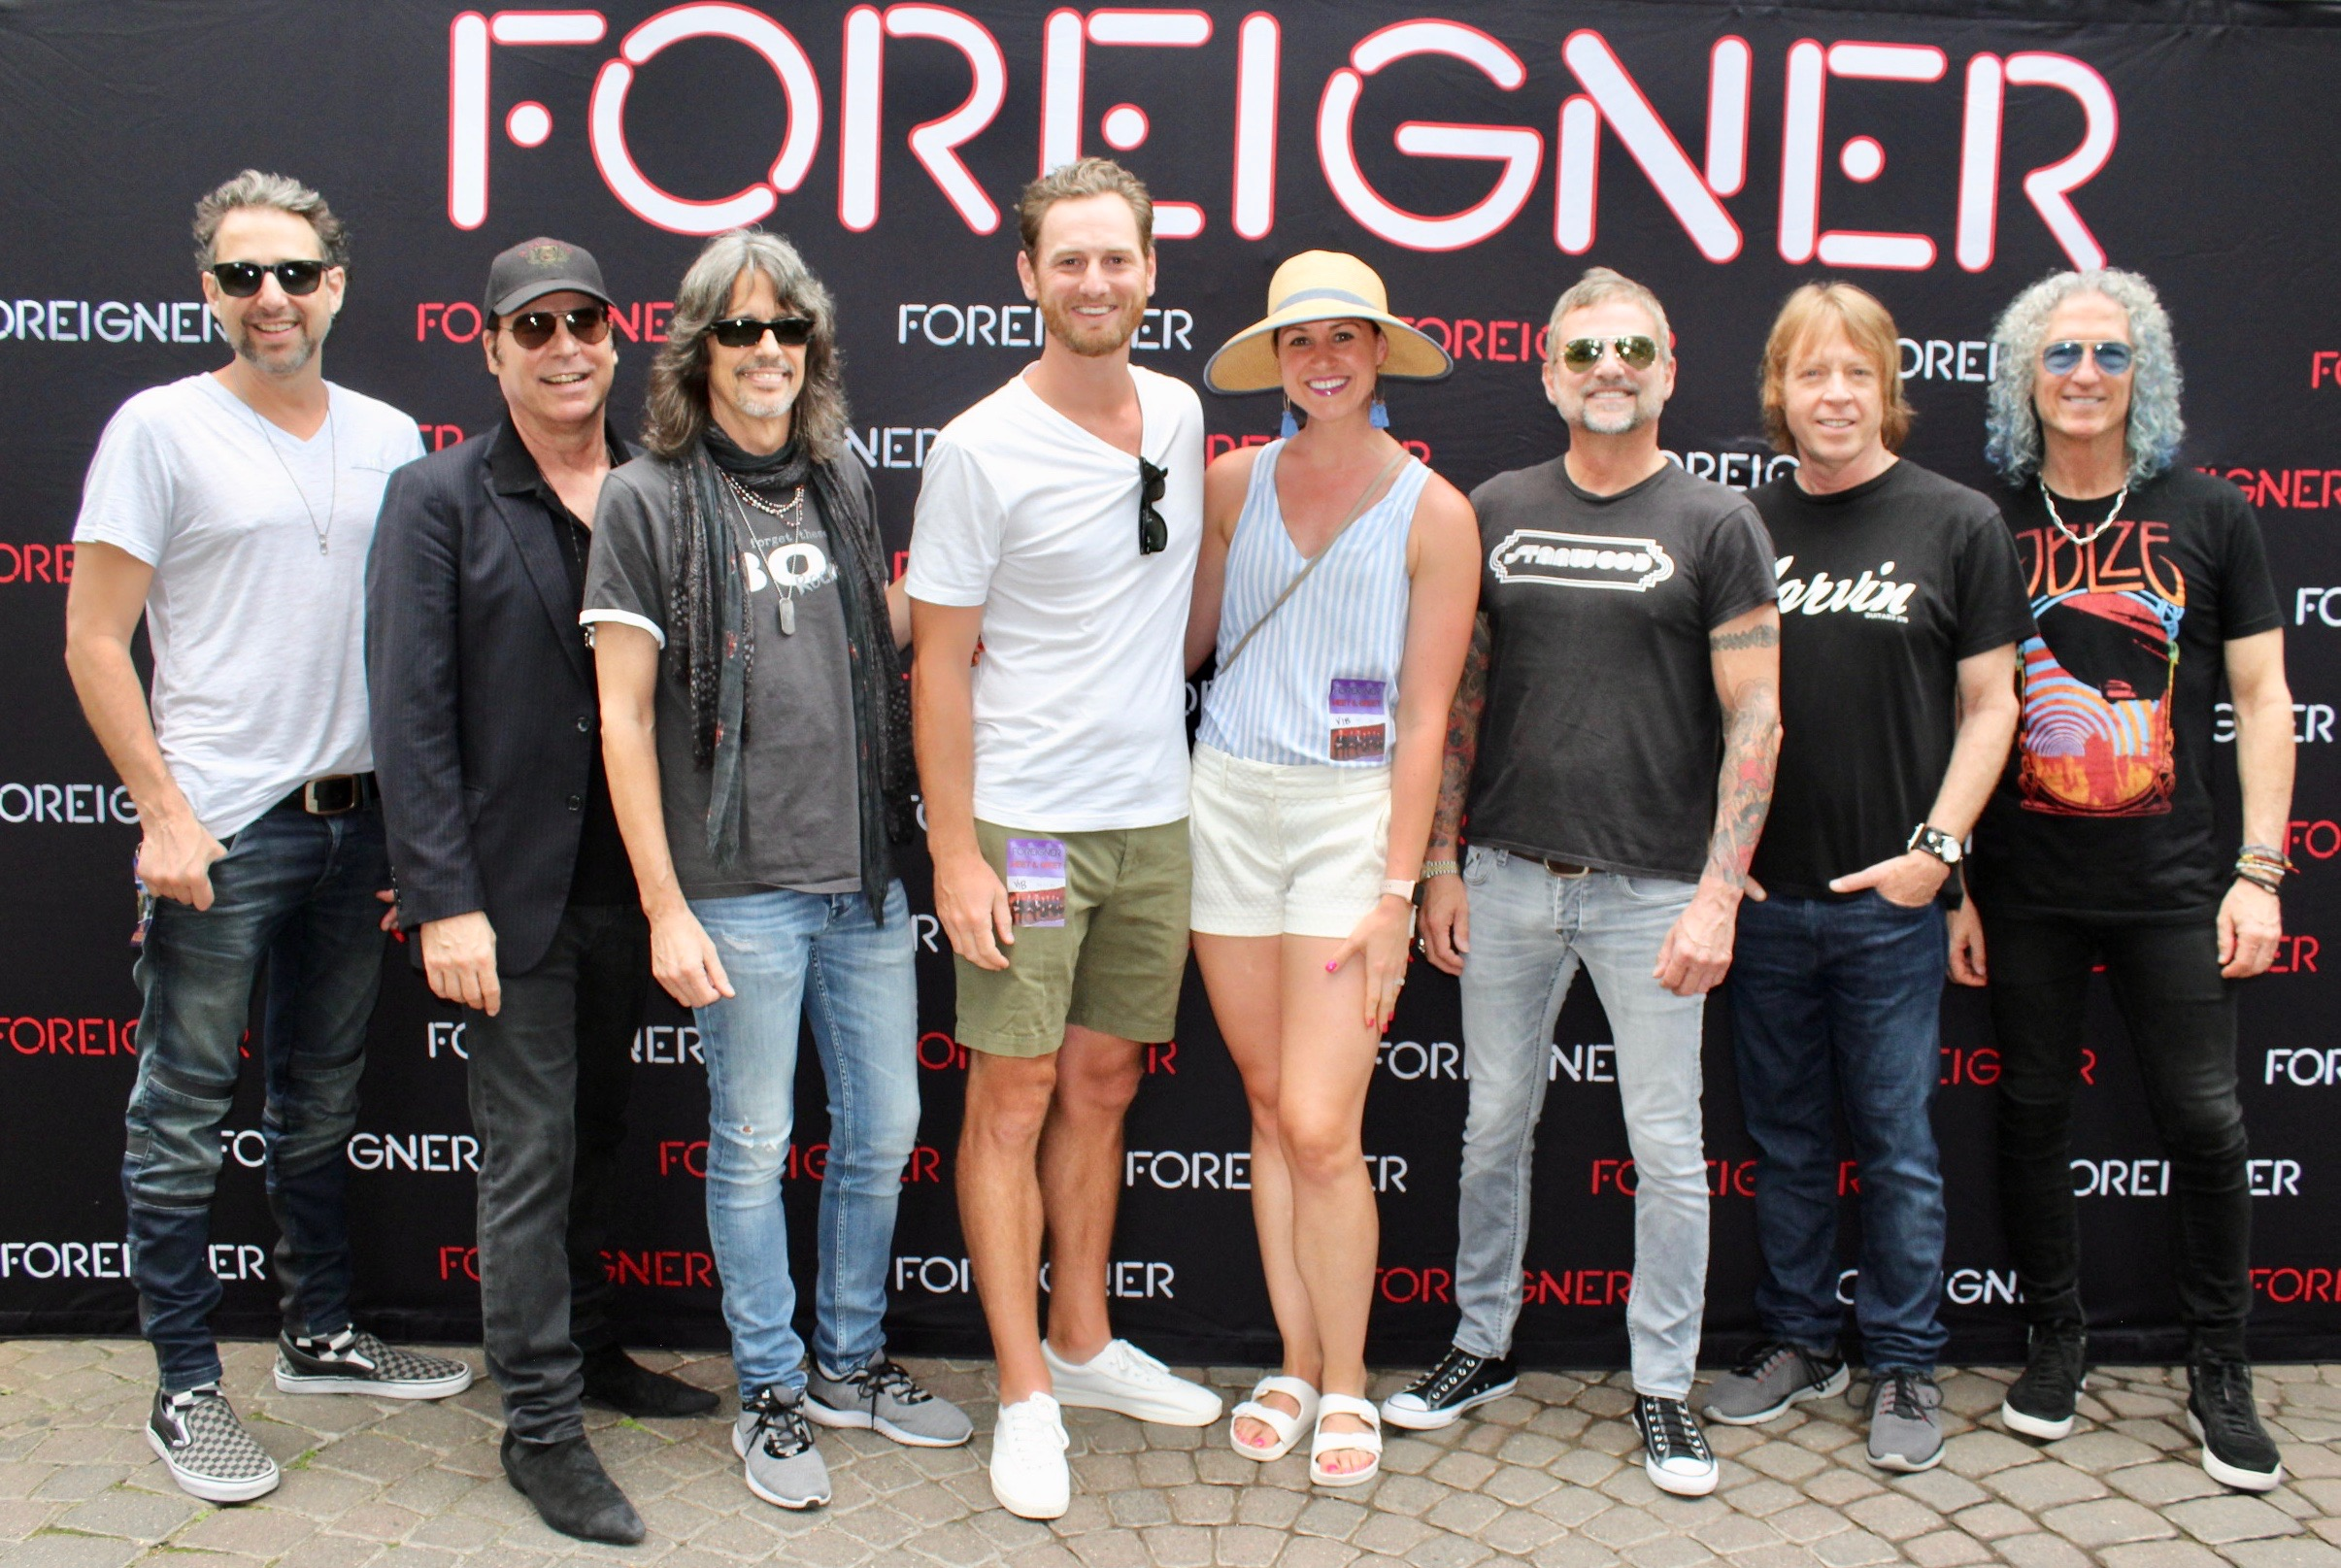 Foreigner Band.jpeg